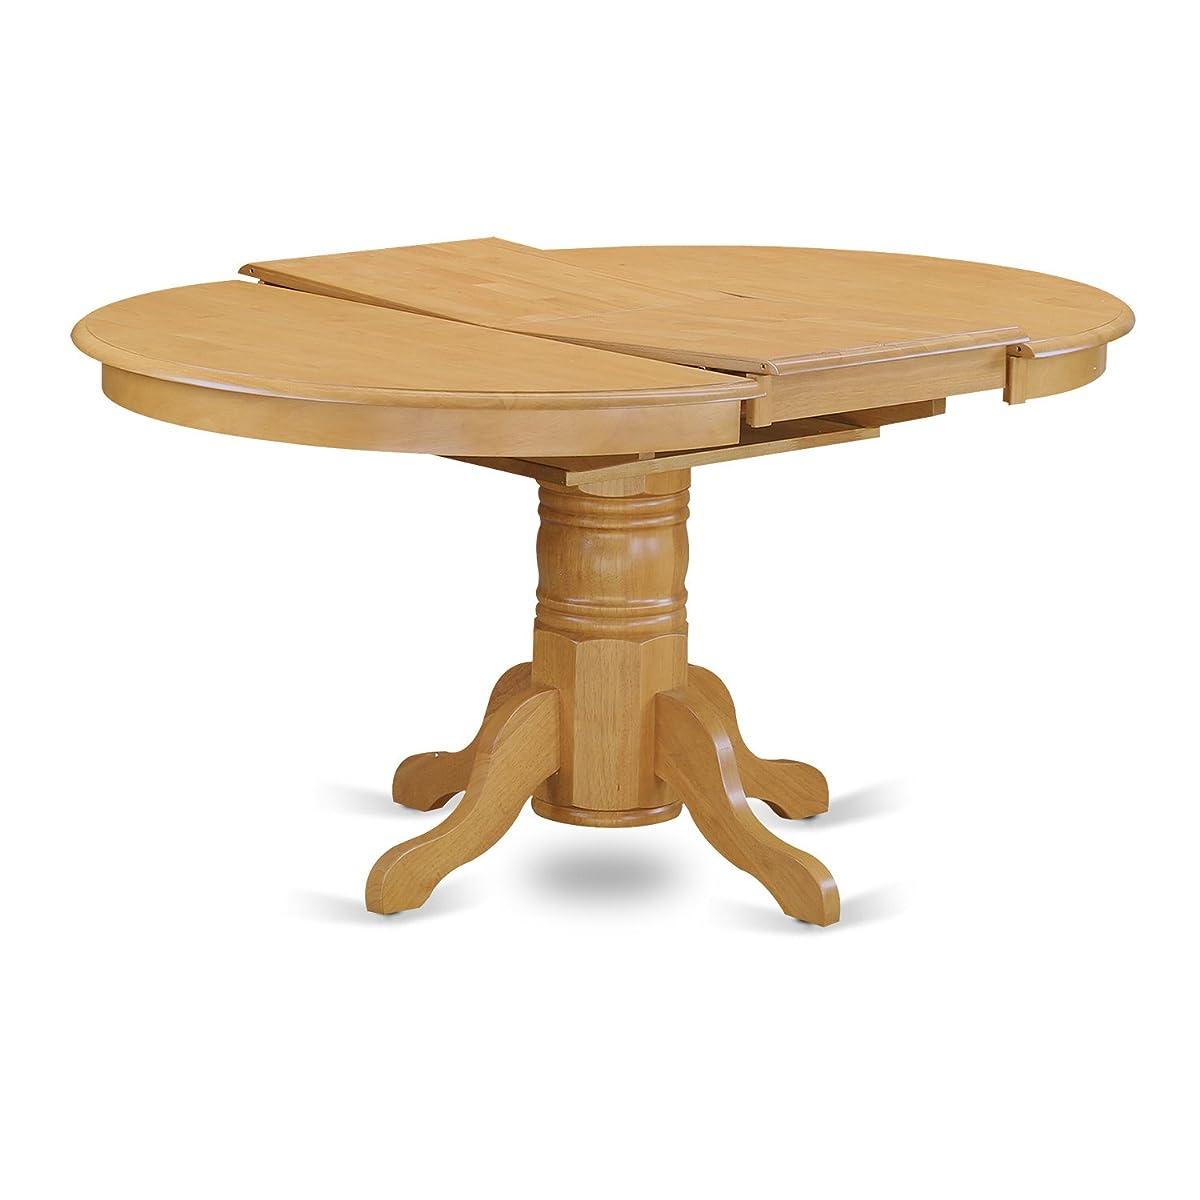 East West Furniture AVT-OAK-TP Single Pedestal Table, Oak Finish